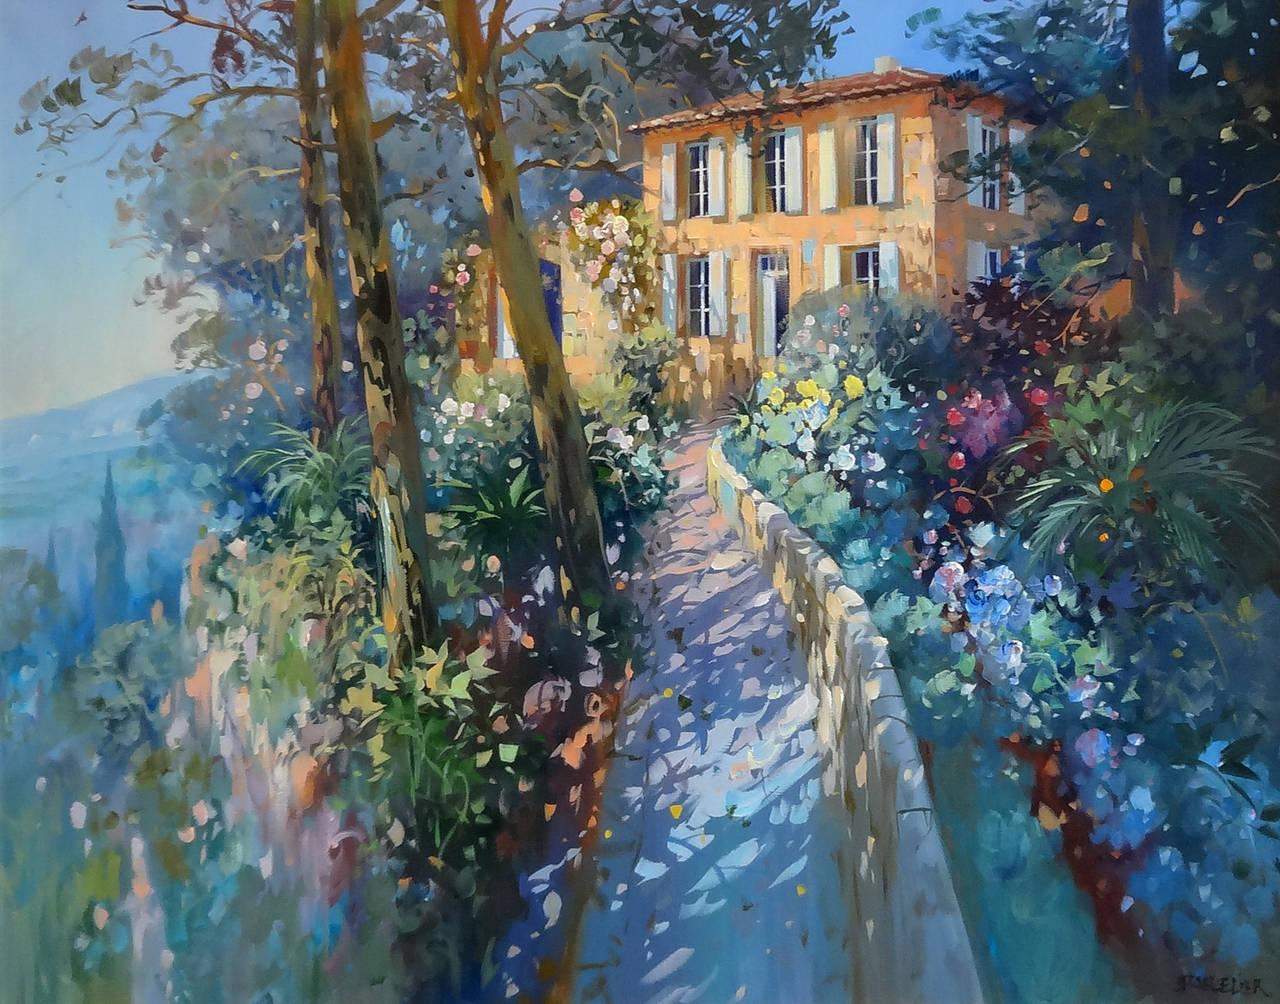 Laurent Parcelier - Sous les Arbres (Under the Trees), Painting at 1stdibs